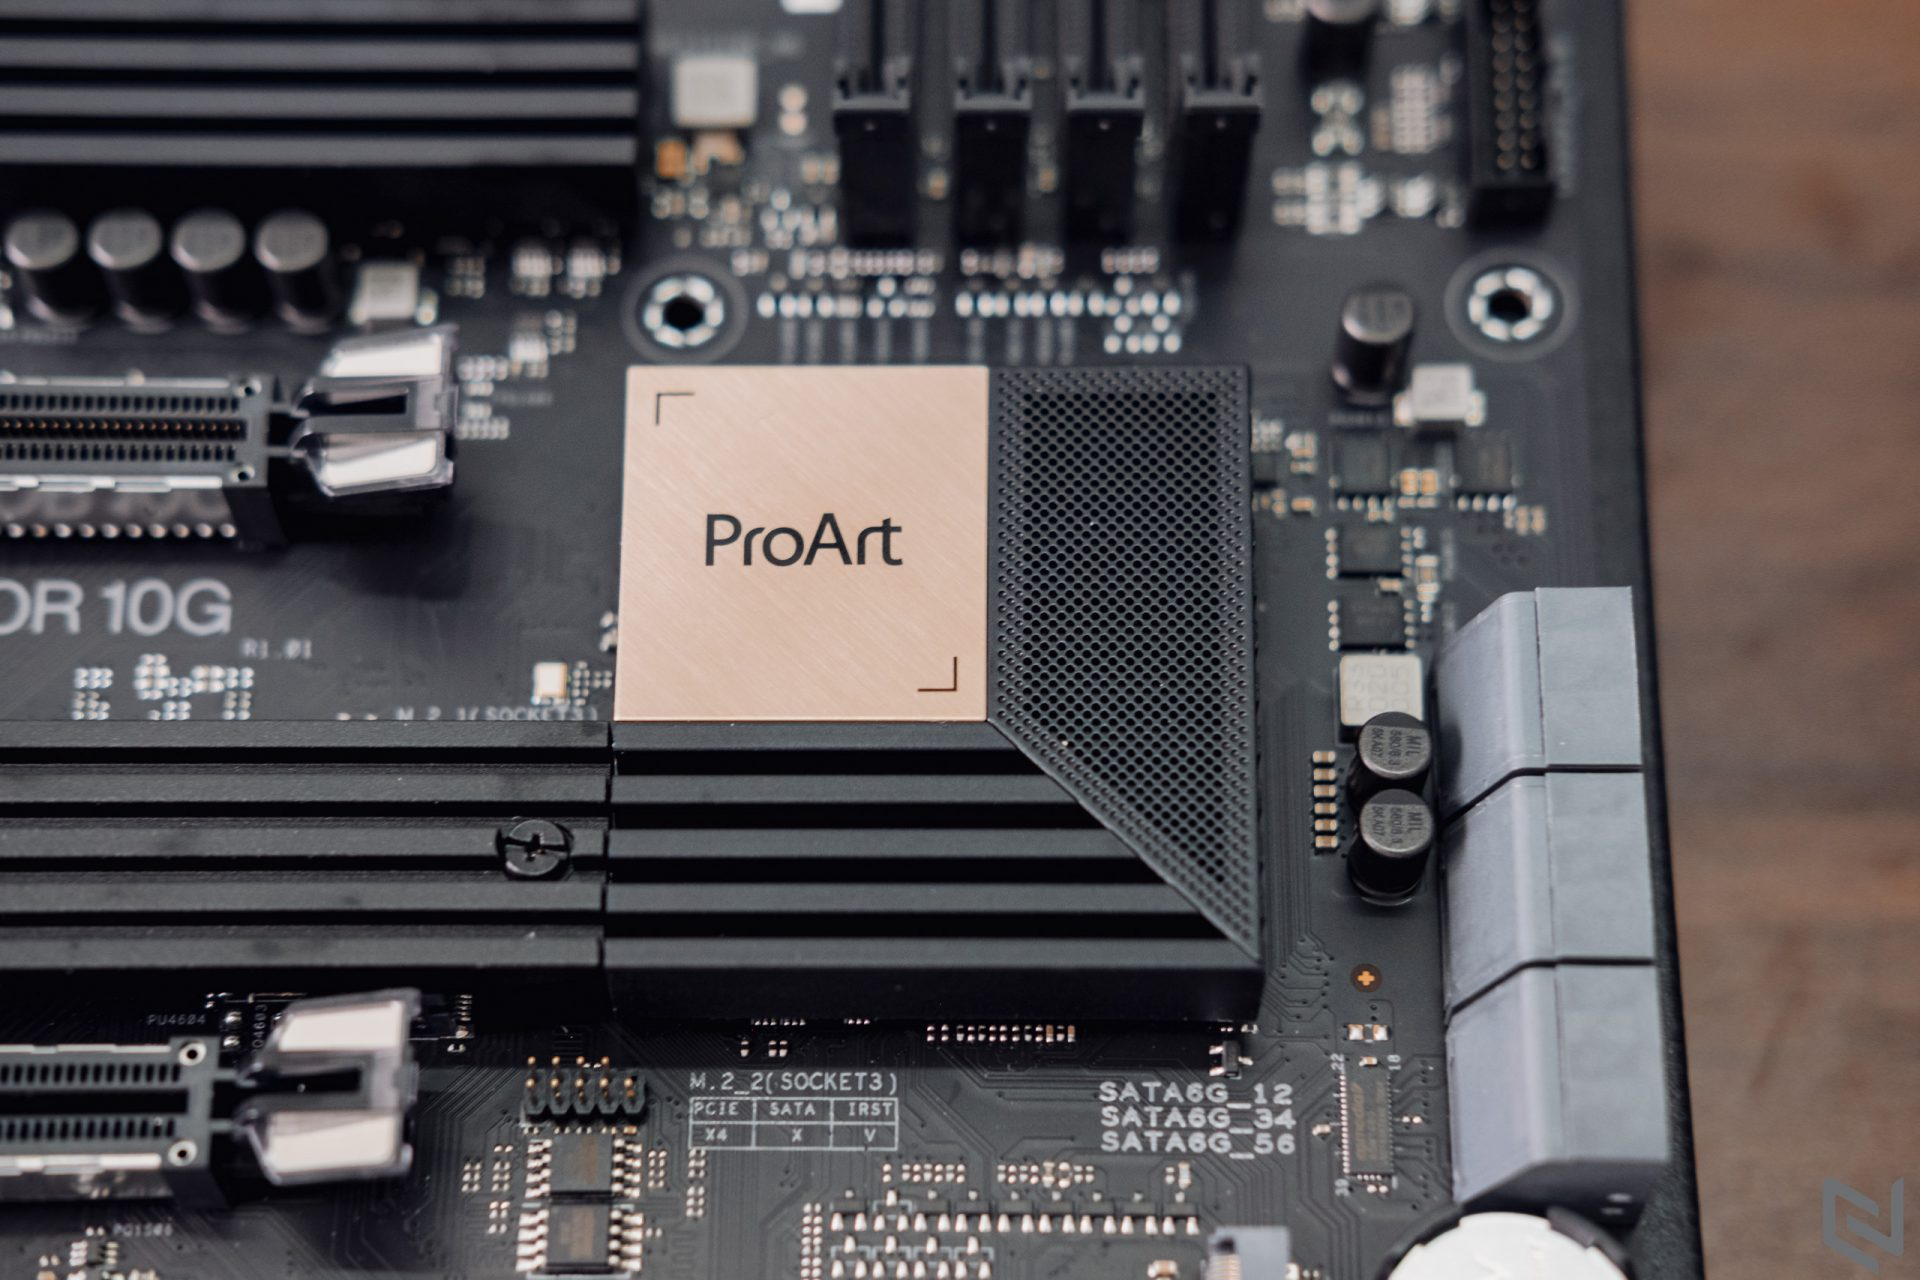 proart-z490-creator-10g-9441-1920x1280-jpg.10338